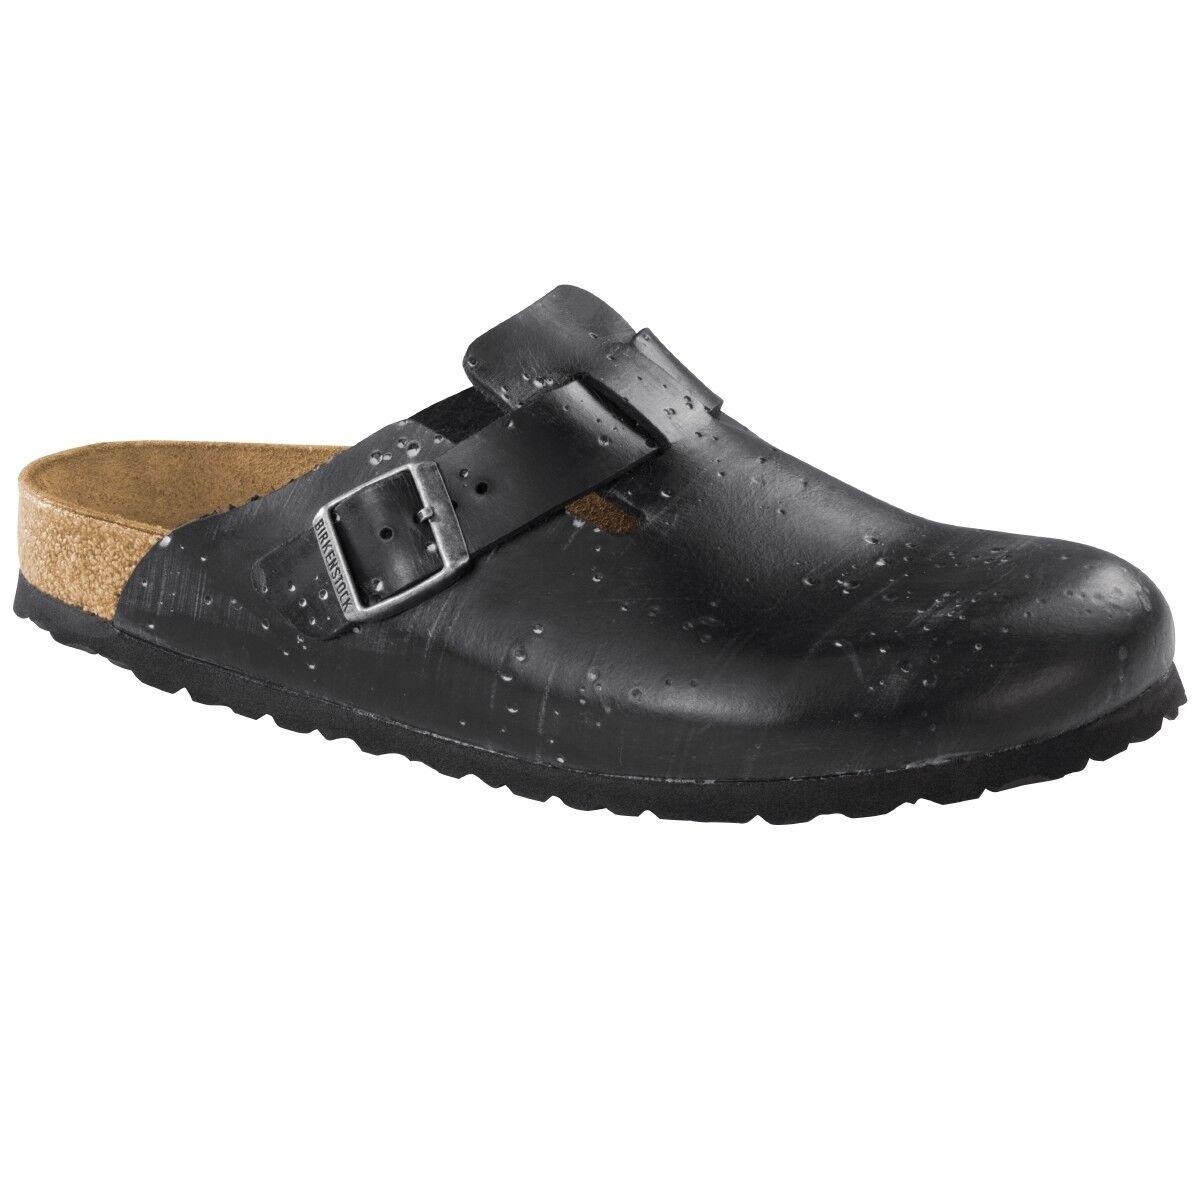 Birkenstock Boston Leder Clogs Schuhe Pantolette 1007375 Clog black Weite schmal 1007375 Pantolette 94192e